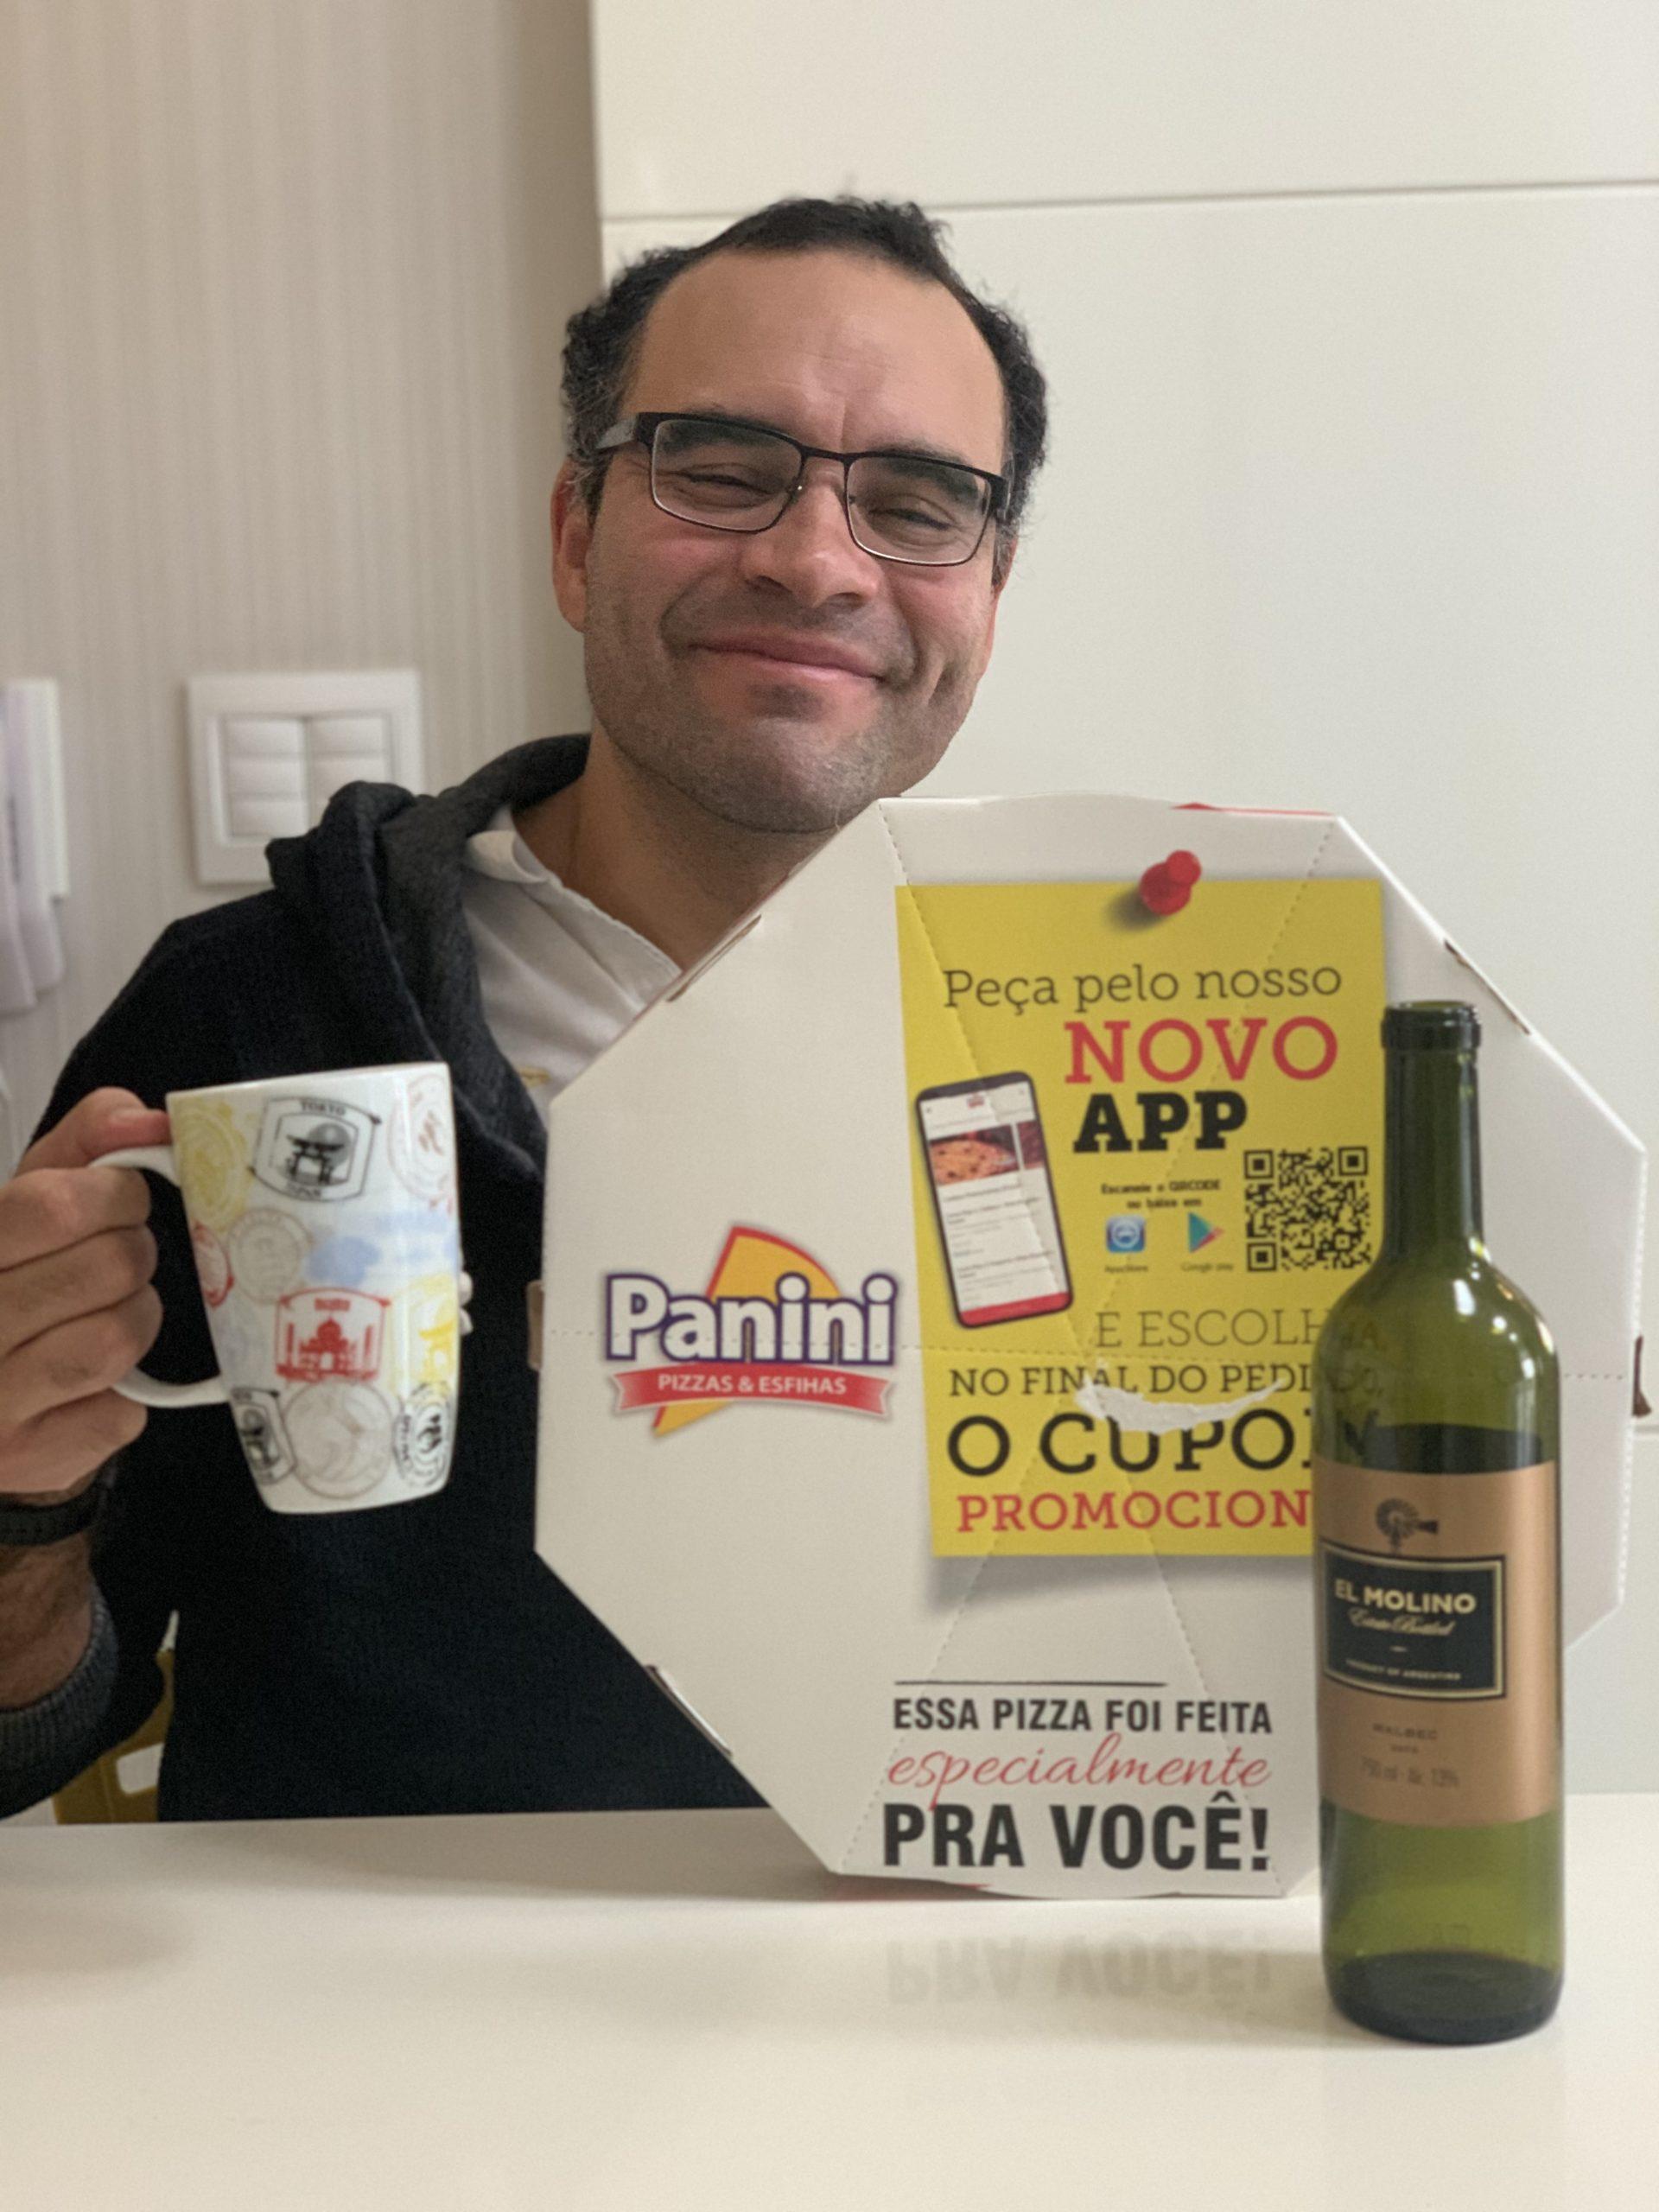 Andrey nosso garoto propaganda da pizza Paninni e vinho El Molino